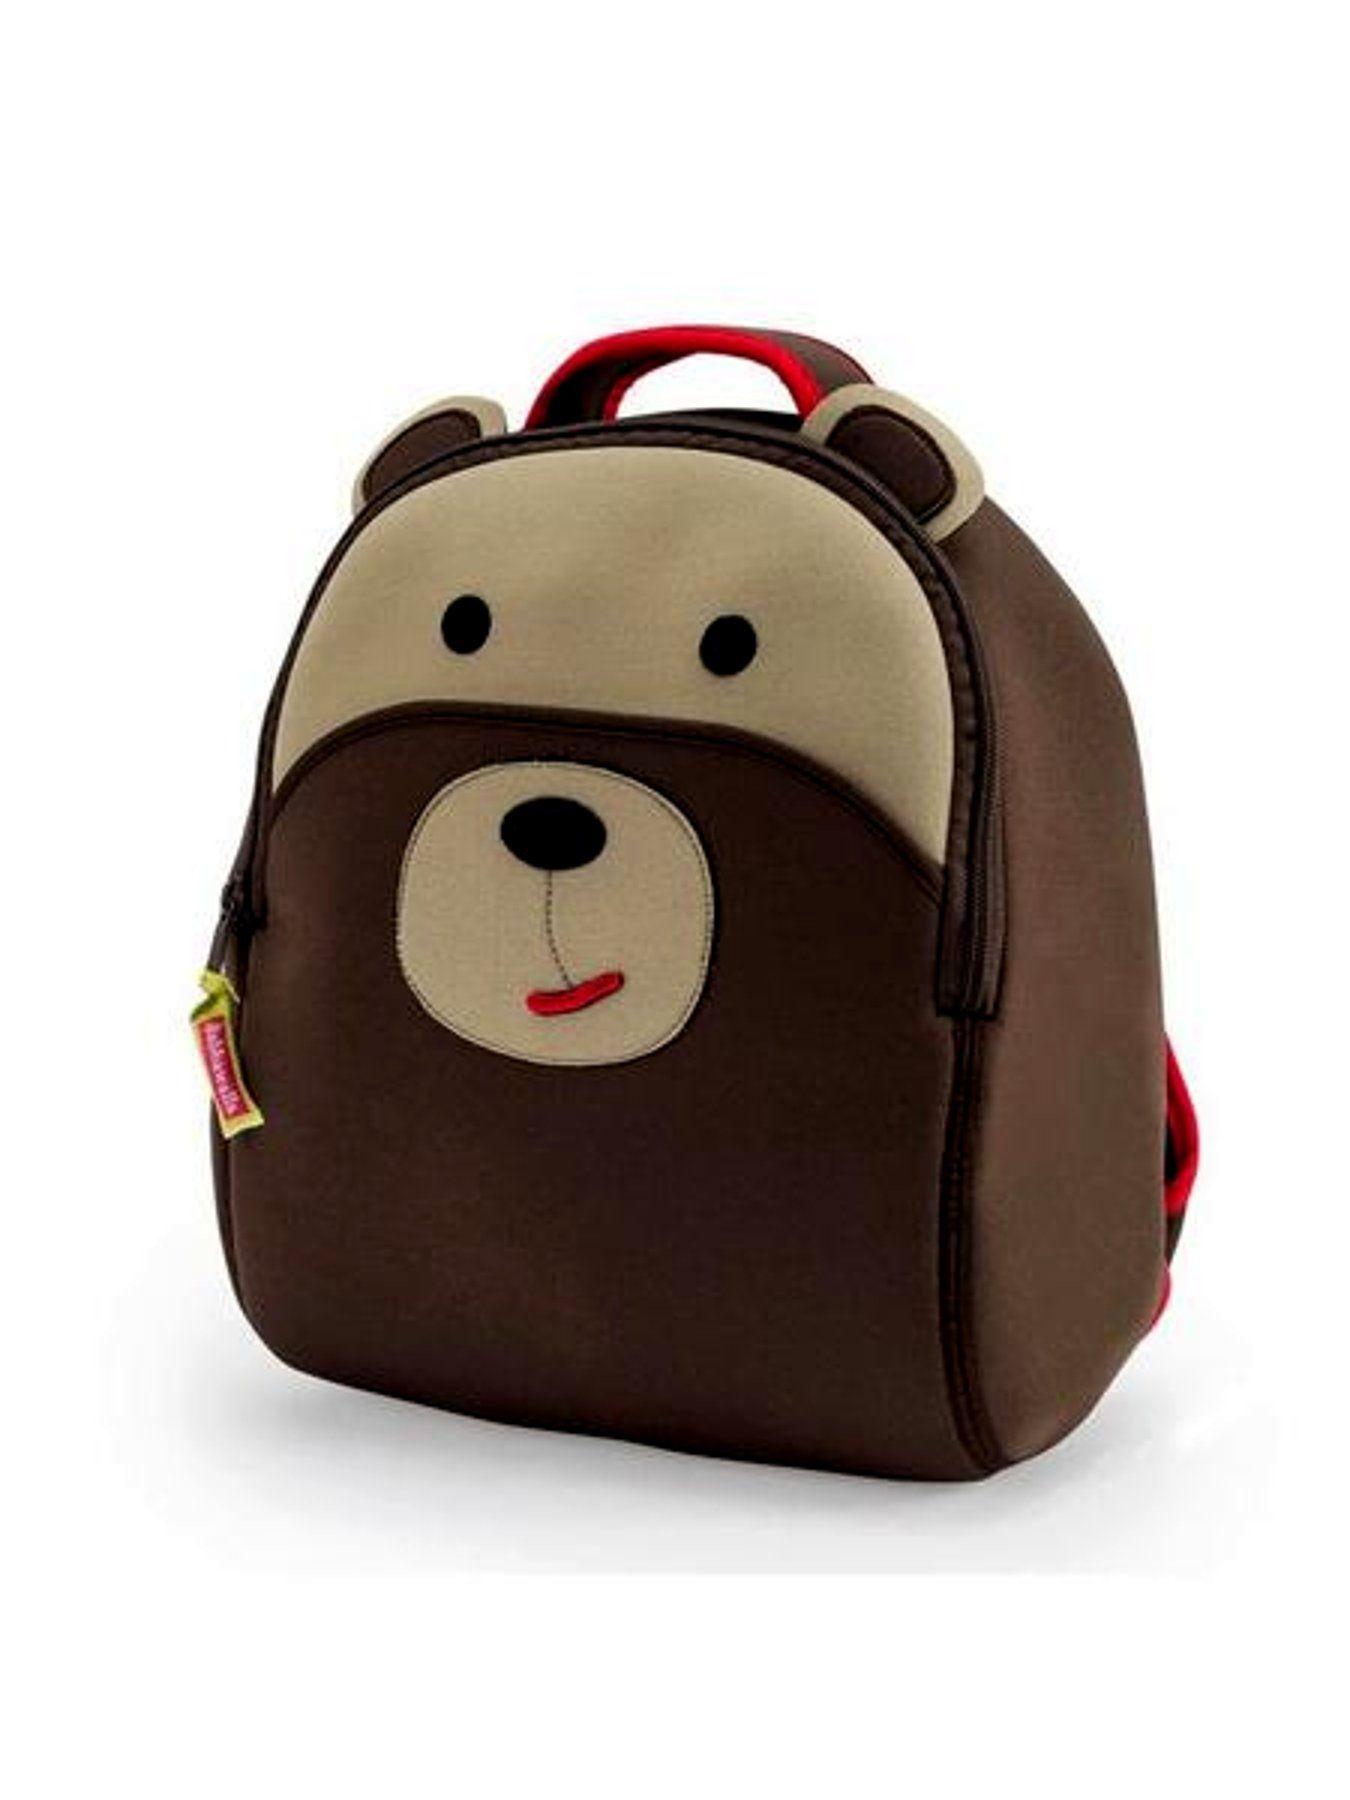 800cd85c1e98 Dabbawalla Kid s Backpacks - Brown Bear